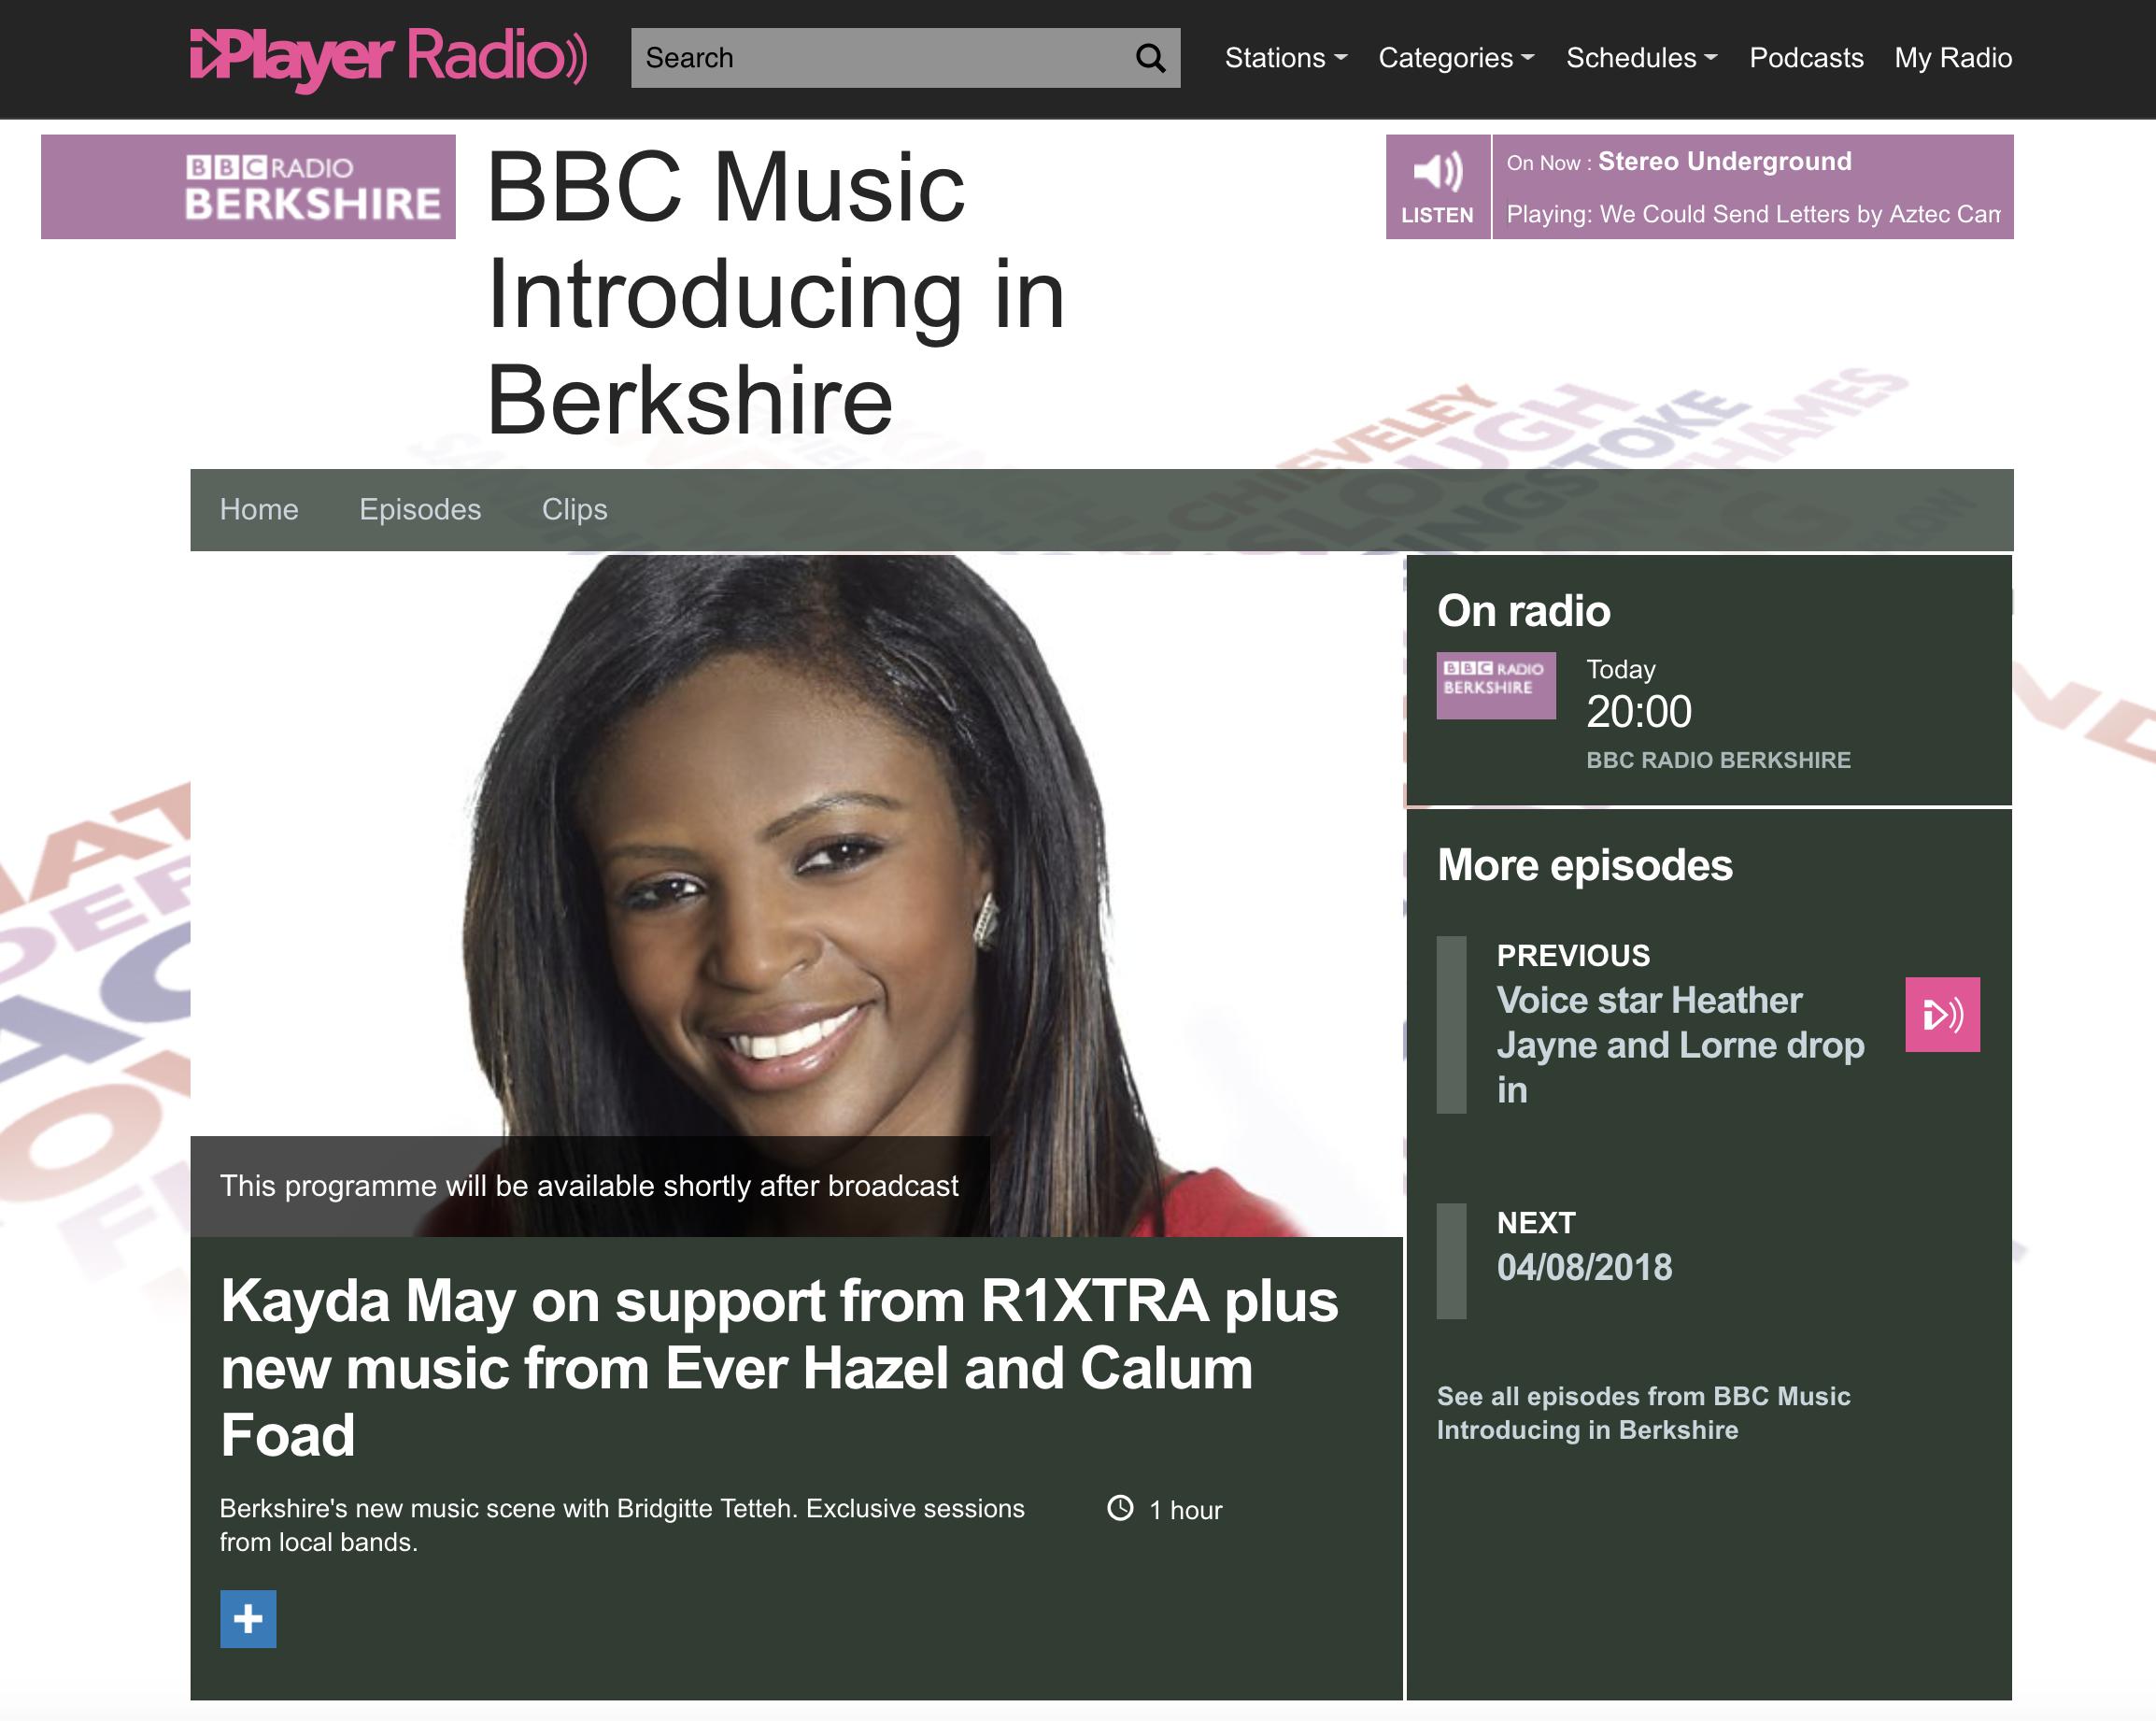 BBC Radio Berkshire (introducing) plays Third Phase